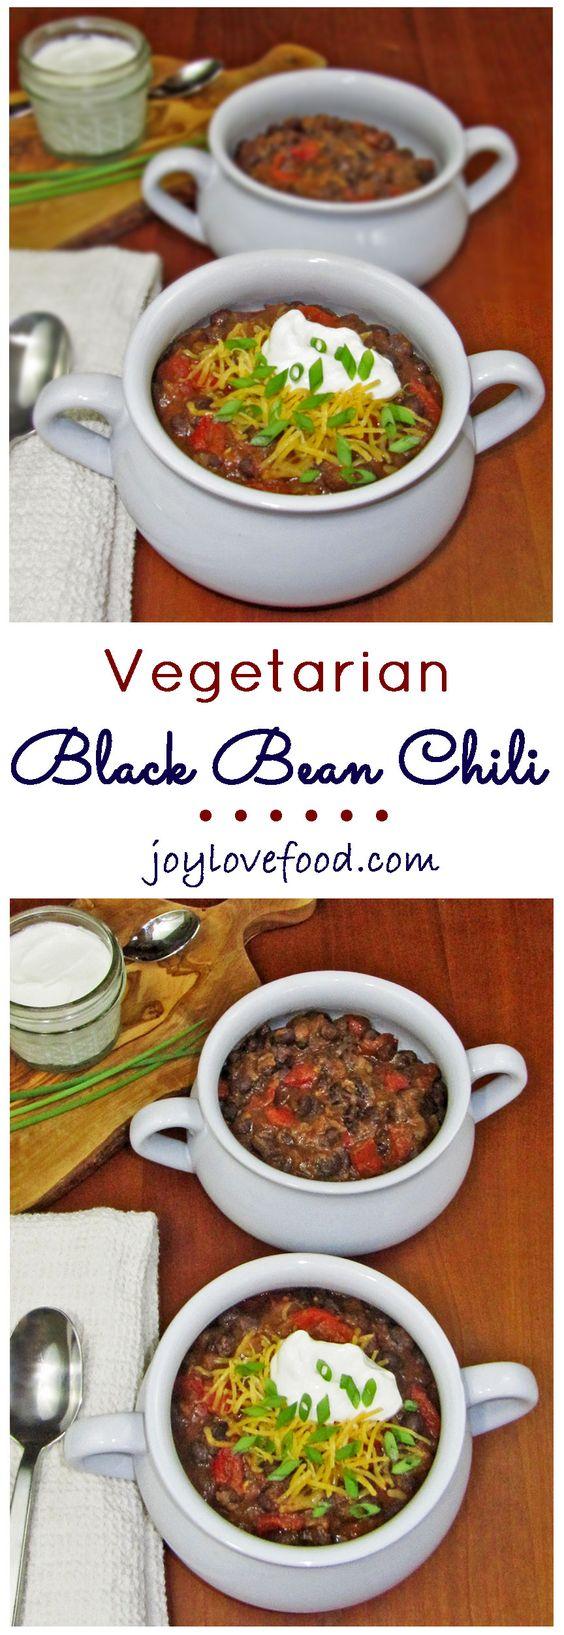 Vegetarian Black Bean Chili | Recipe | Black Bean Chili, Bean Chili ...